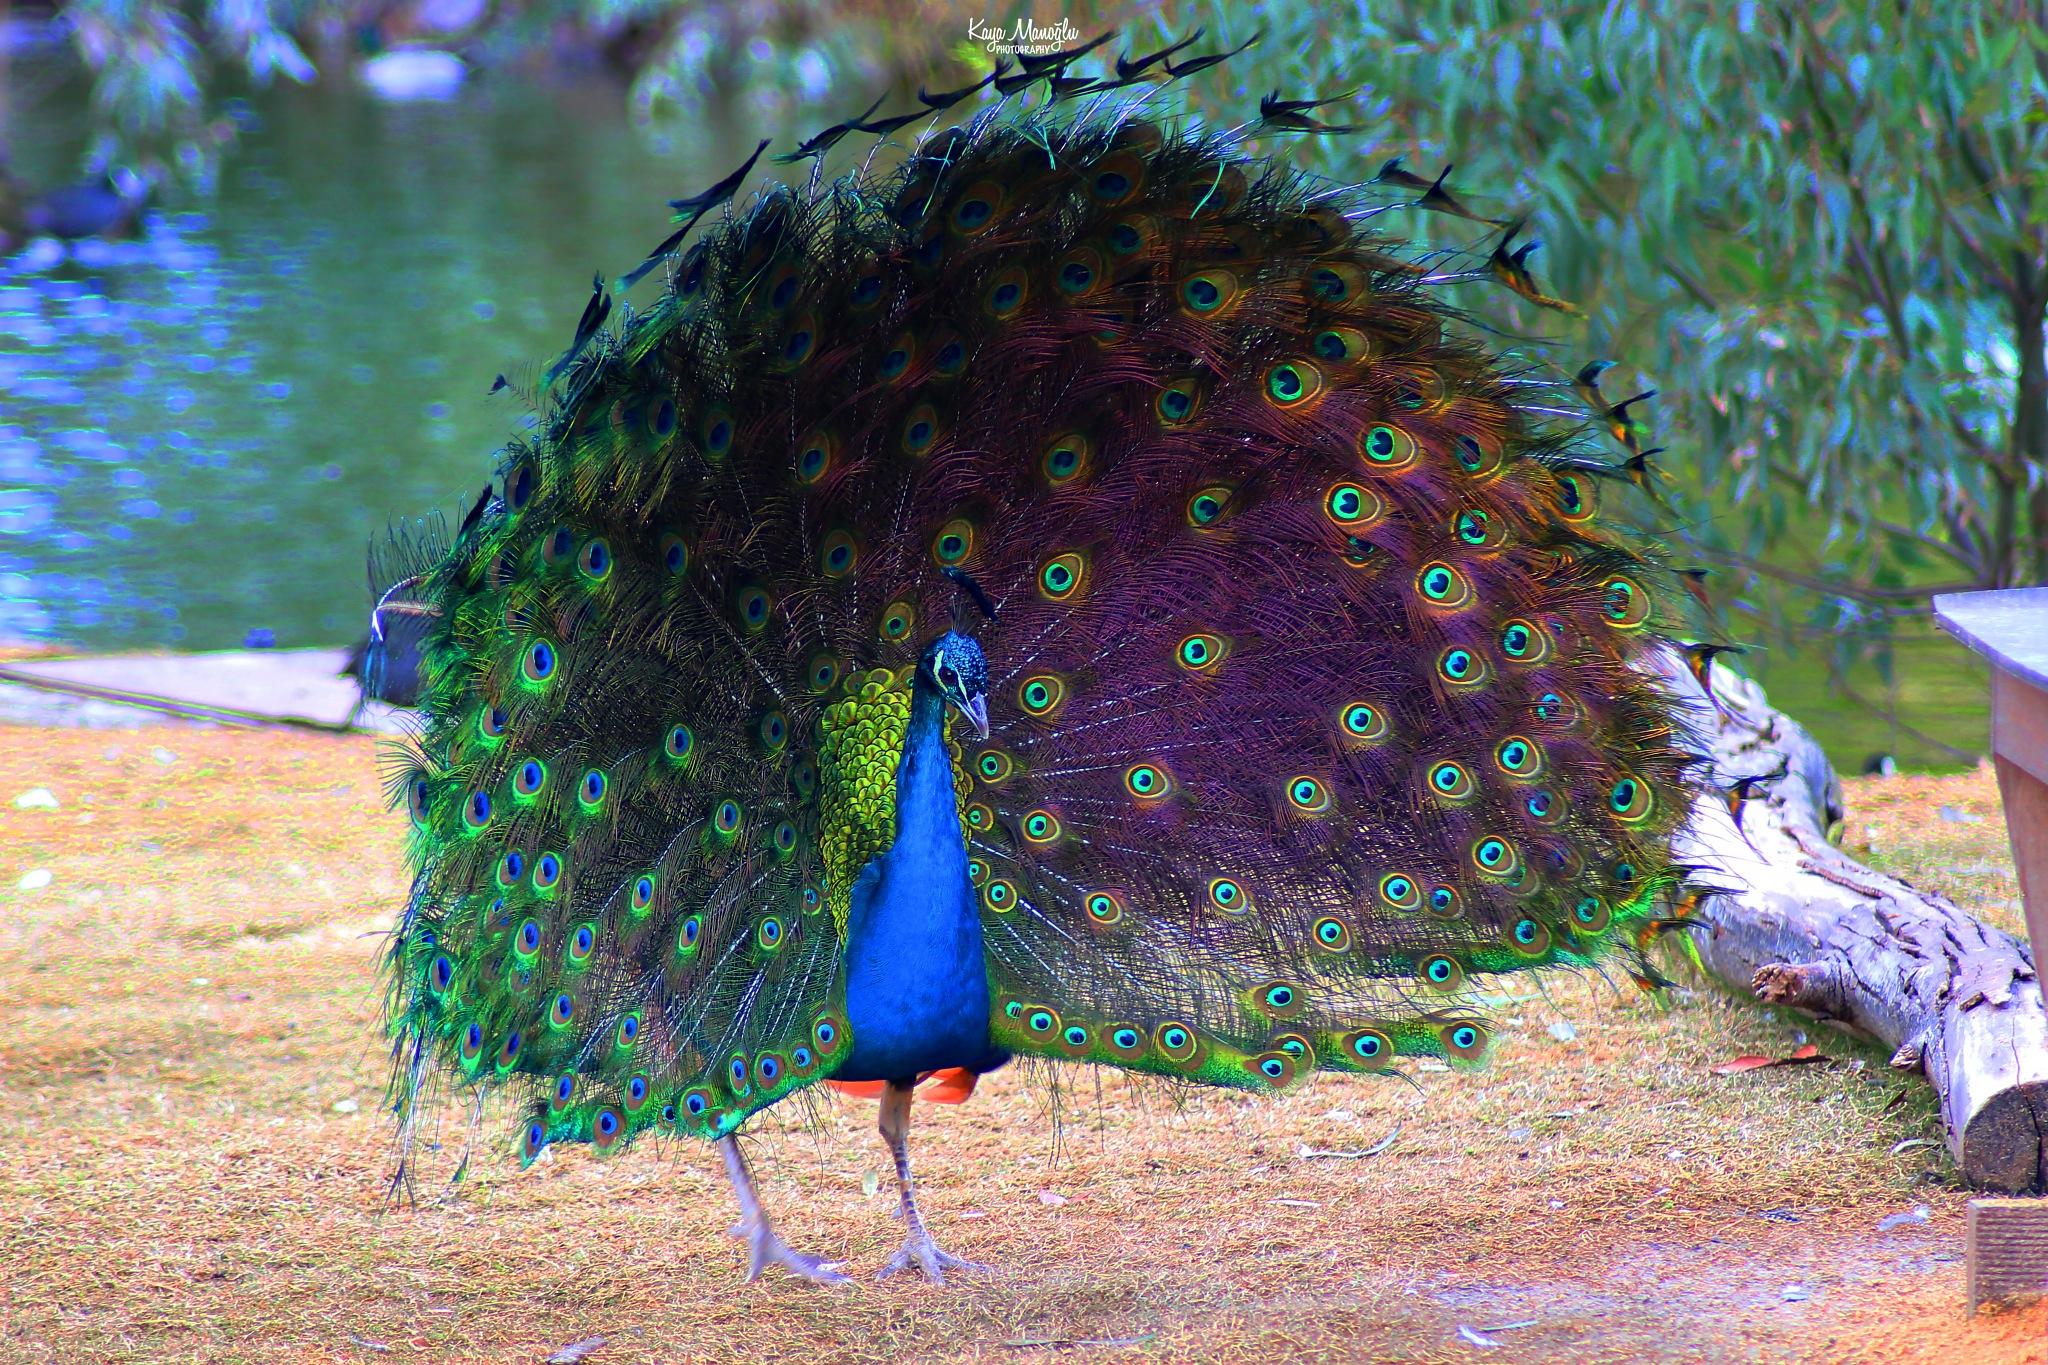 The Peacock by Kaya Manoglu